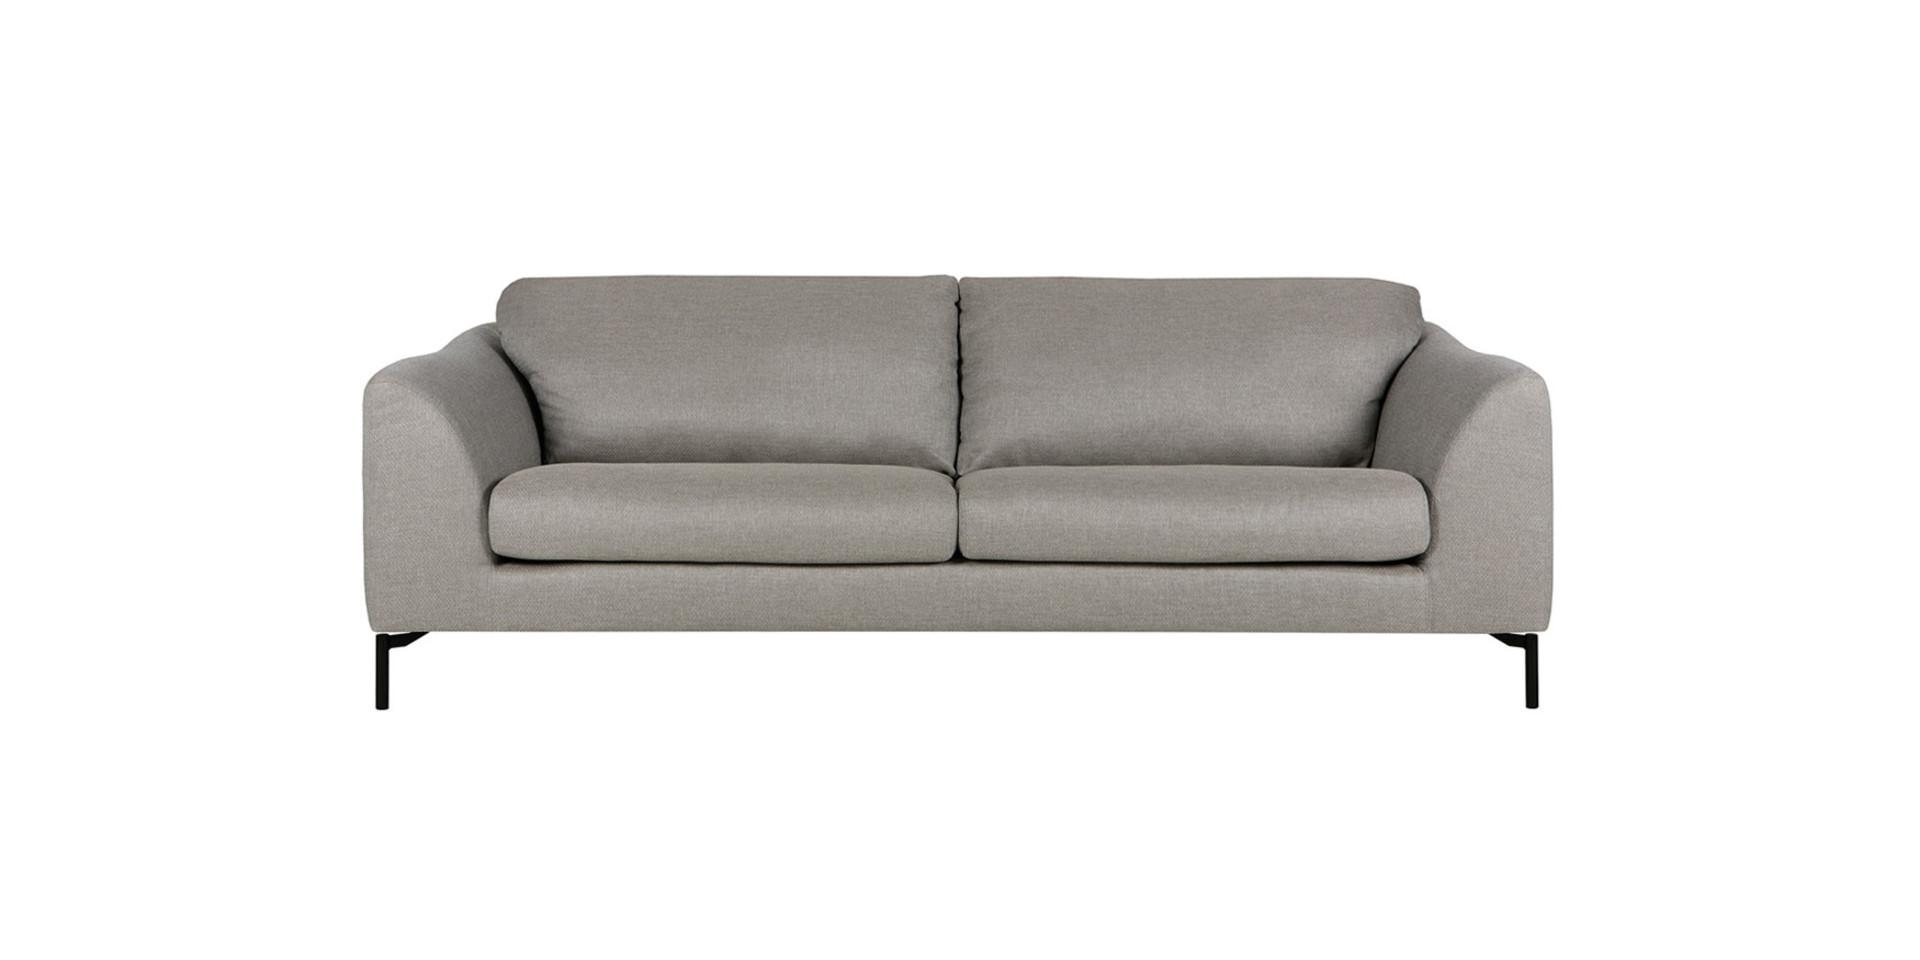 sits-klara-canape-3seater_himalaya3_grey_beige_1